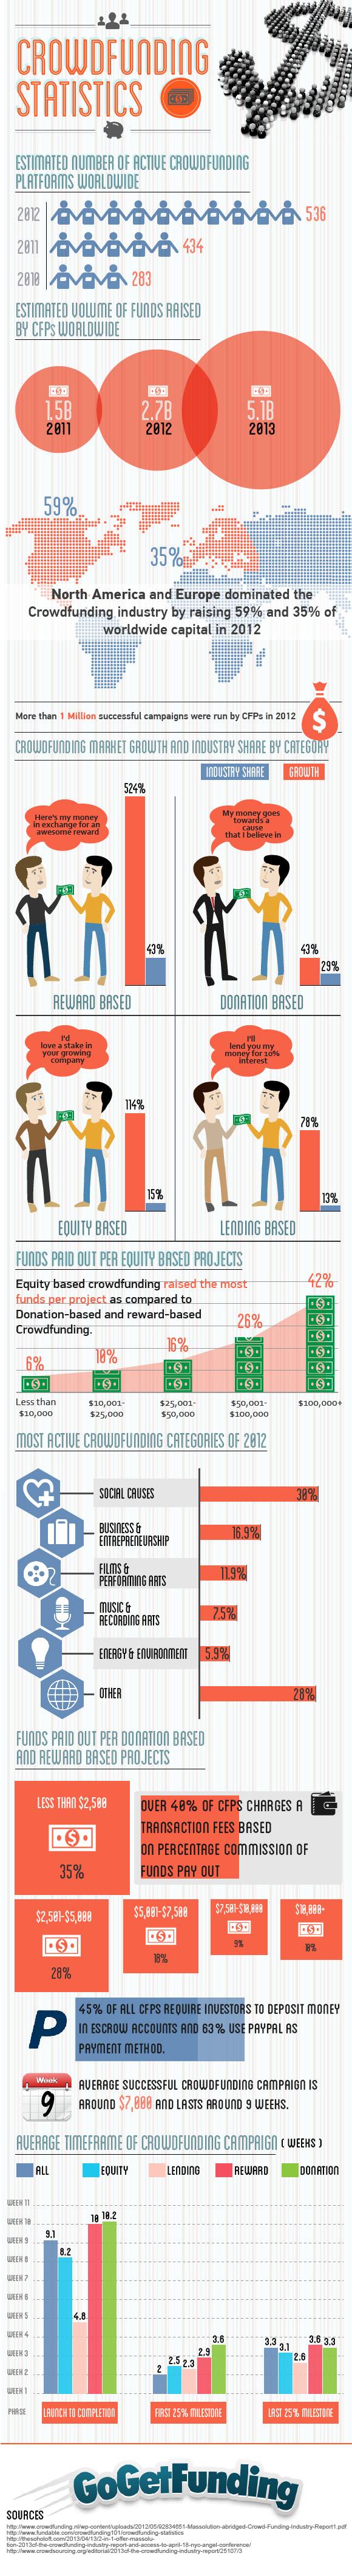 Crowdfunding statistics & trends [infographic]